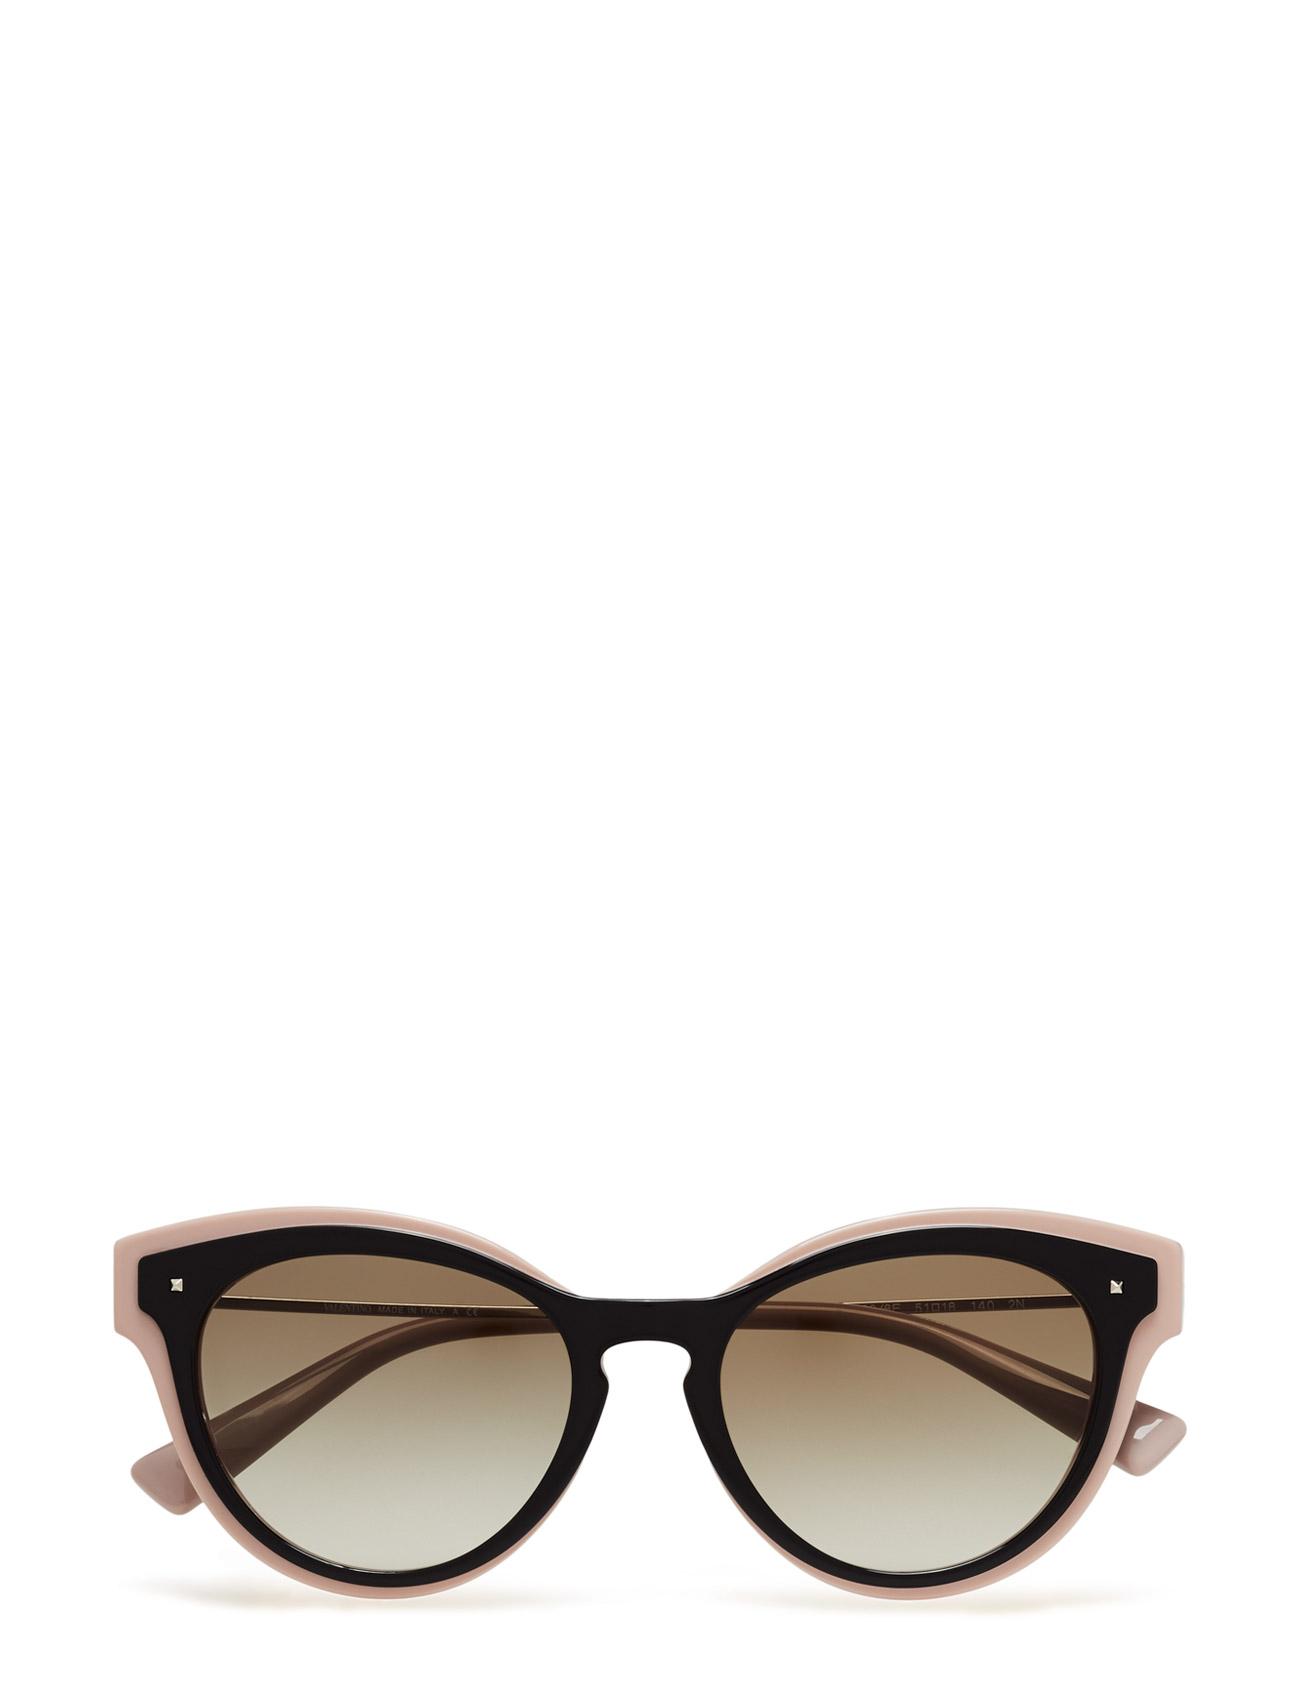 Not Defined Valentino Sunglasses Solbriller til Damer i